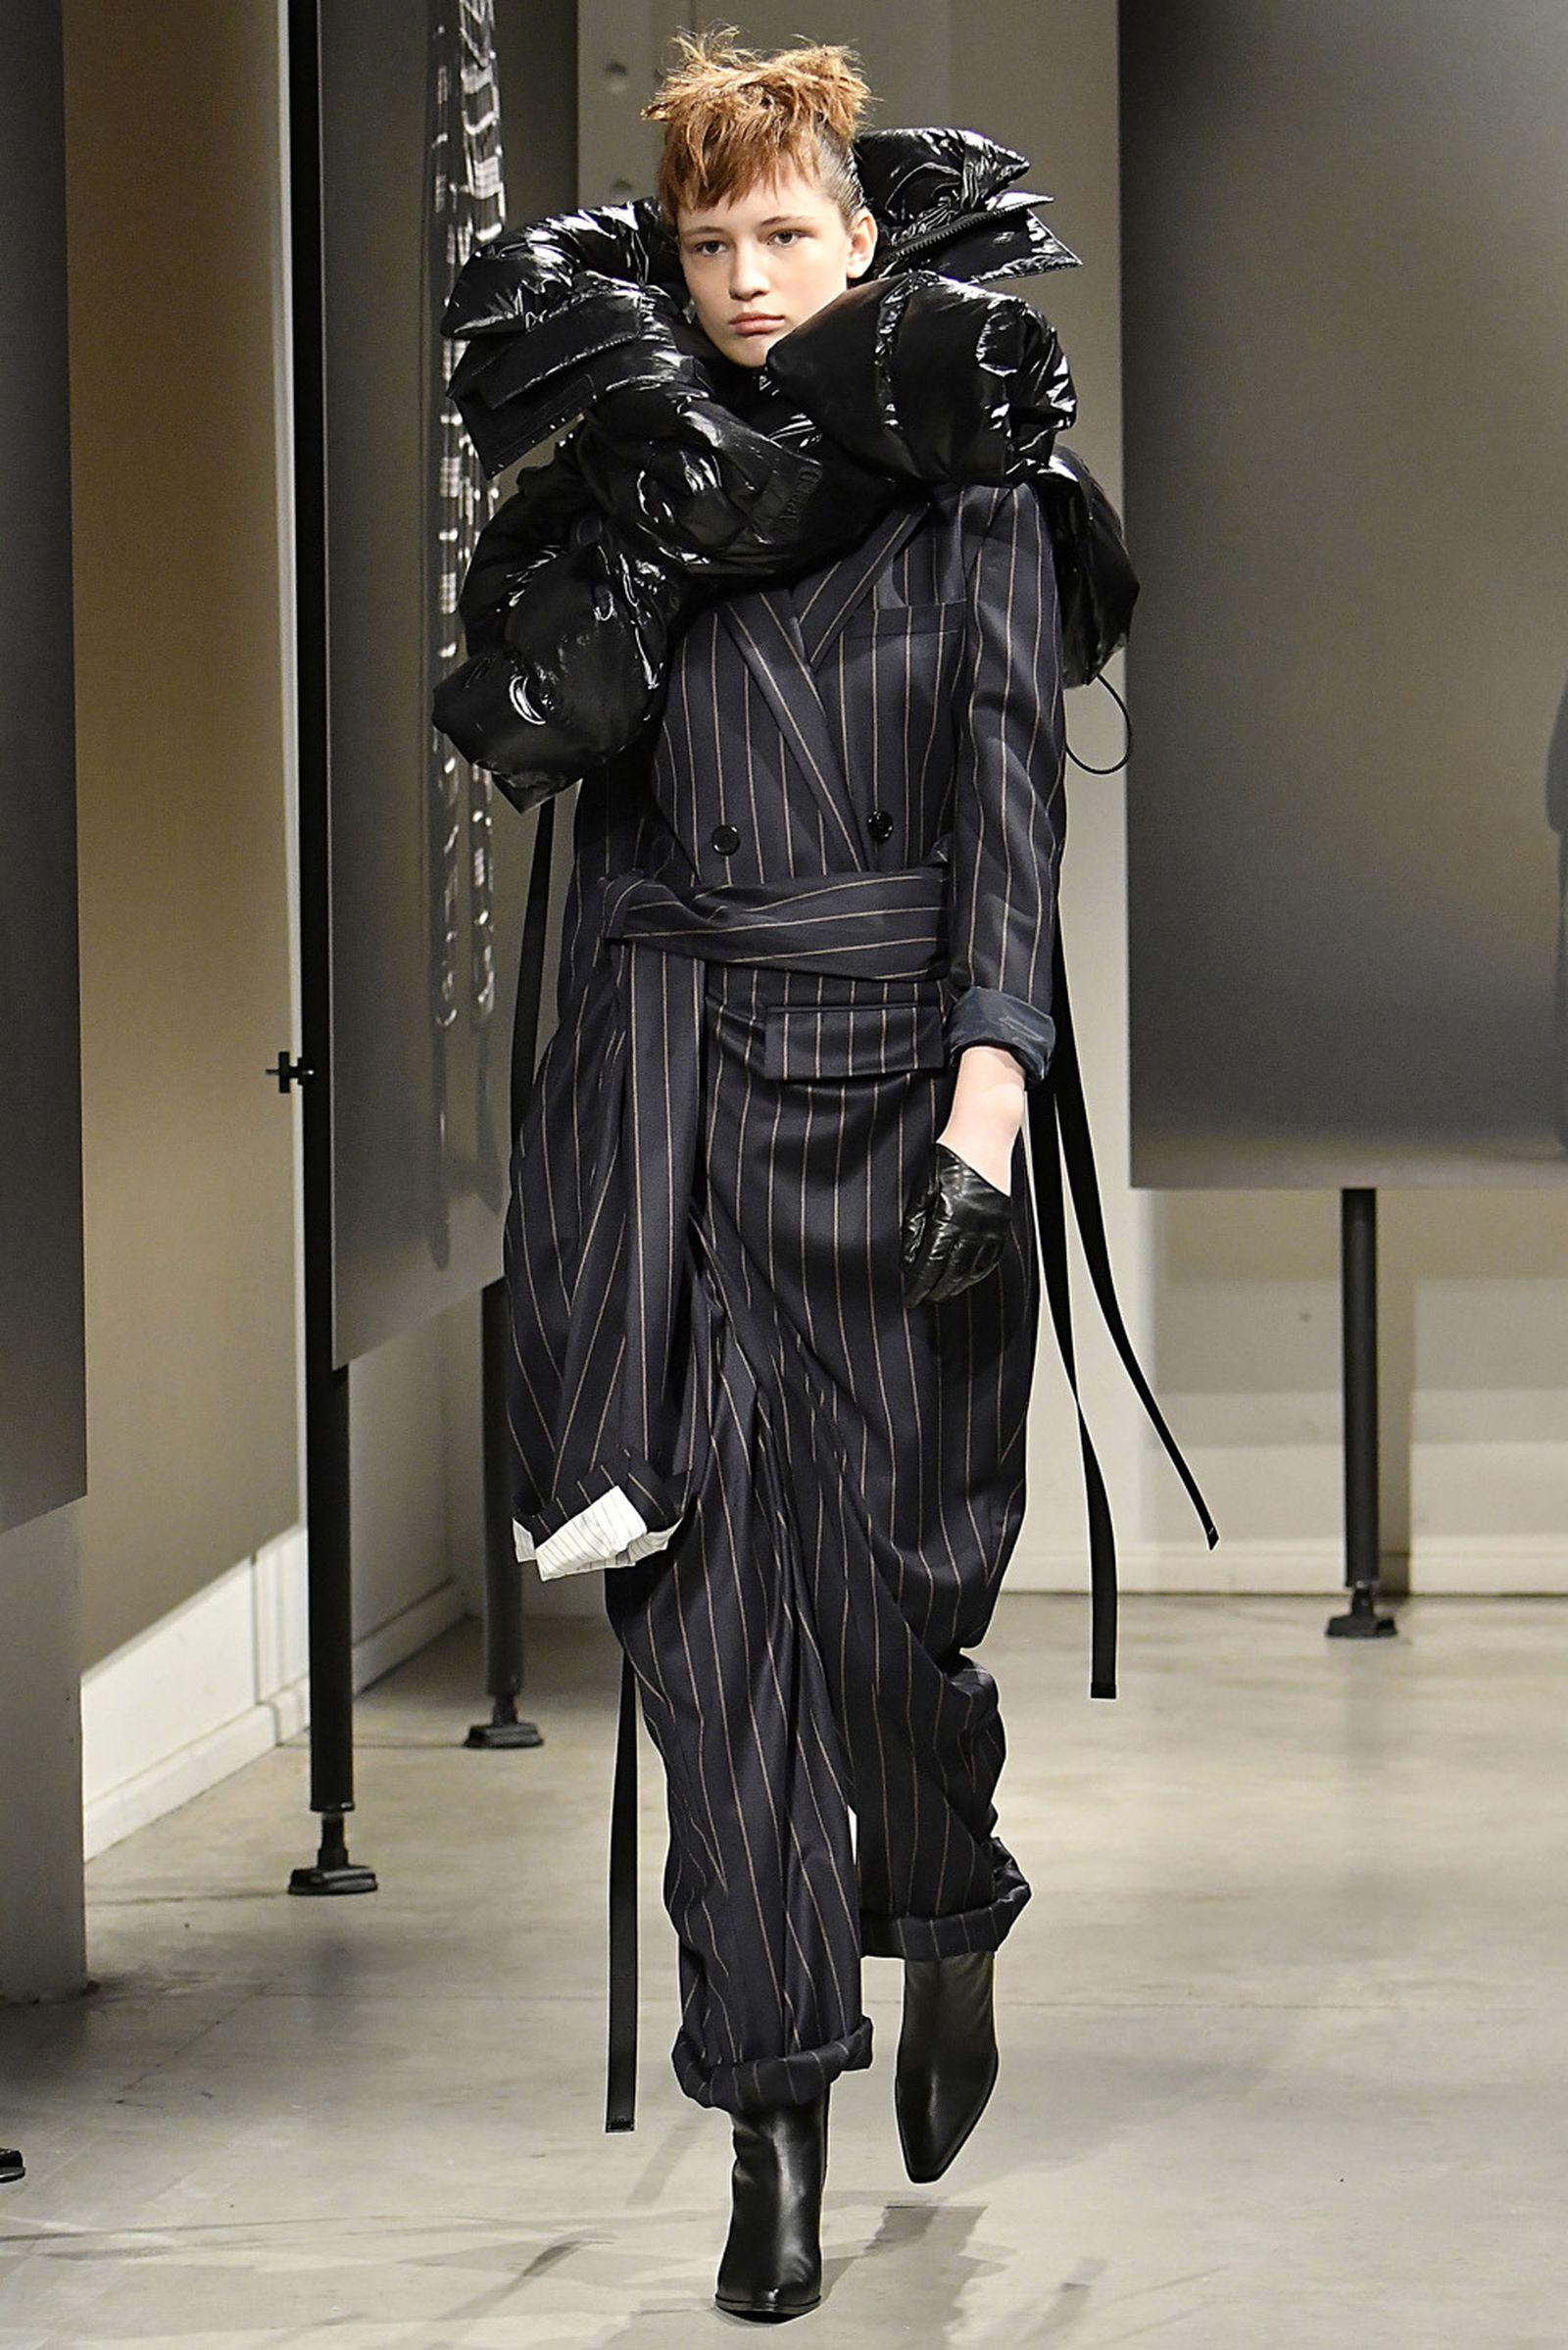 Juun J Paris Fashion Week Men Fall Winter 2018 19 Paris January 2018 Fall/WInter 2018 juun j. runway